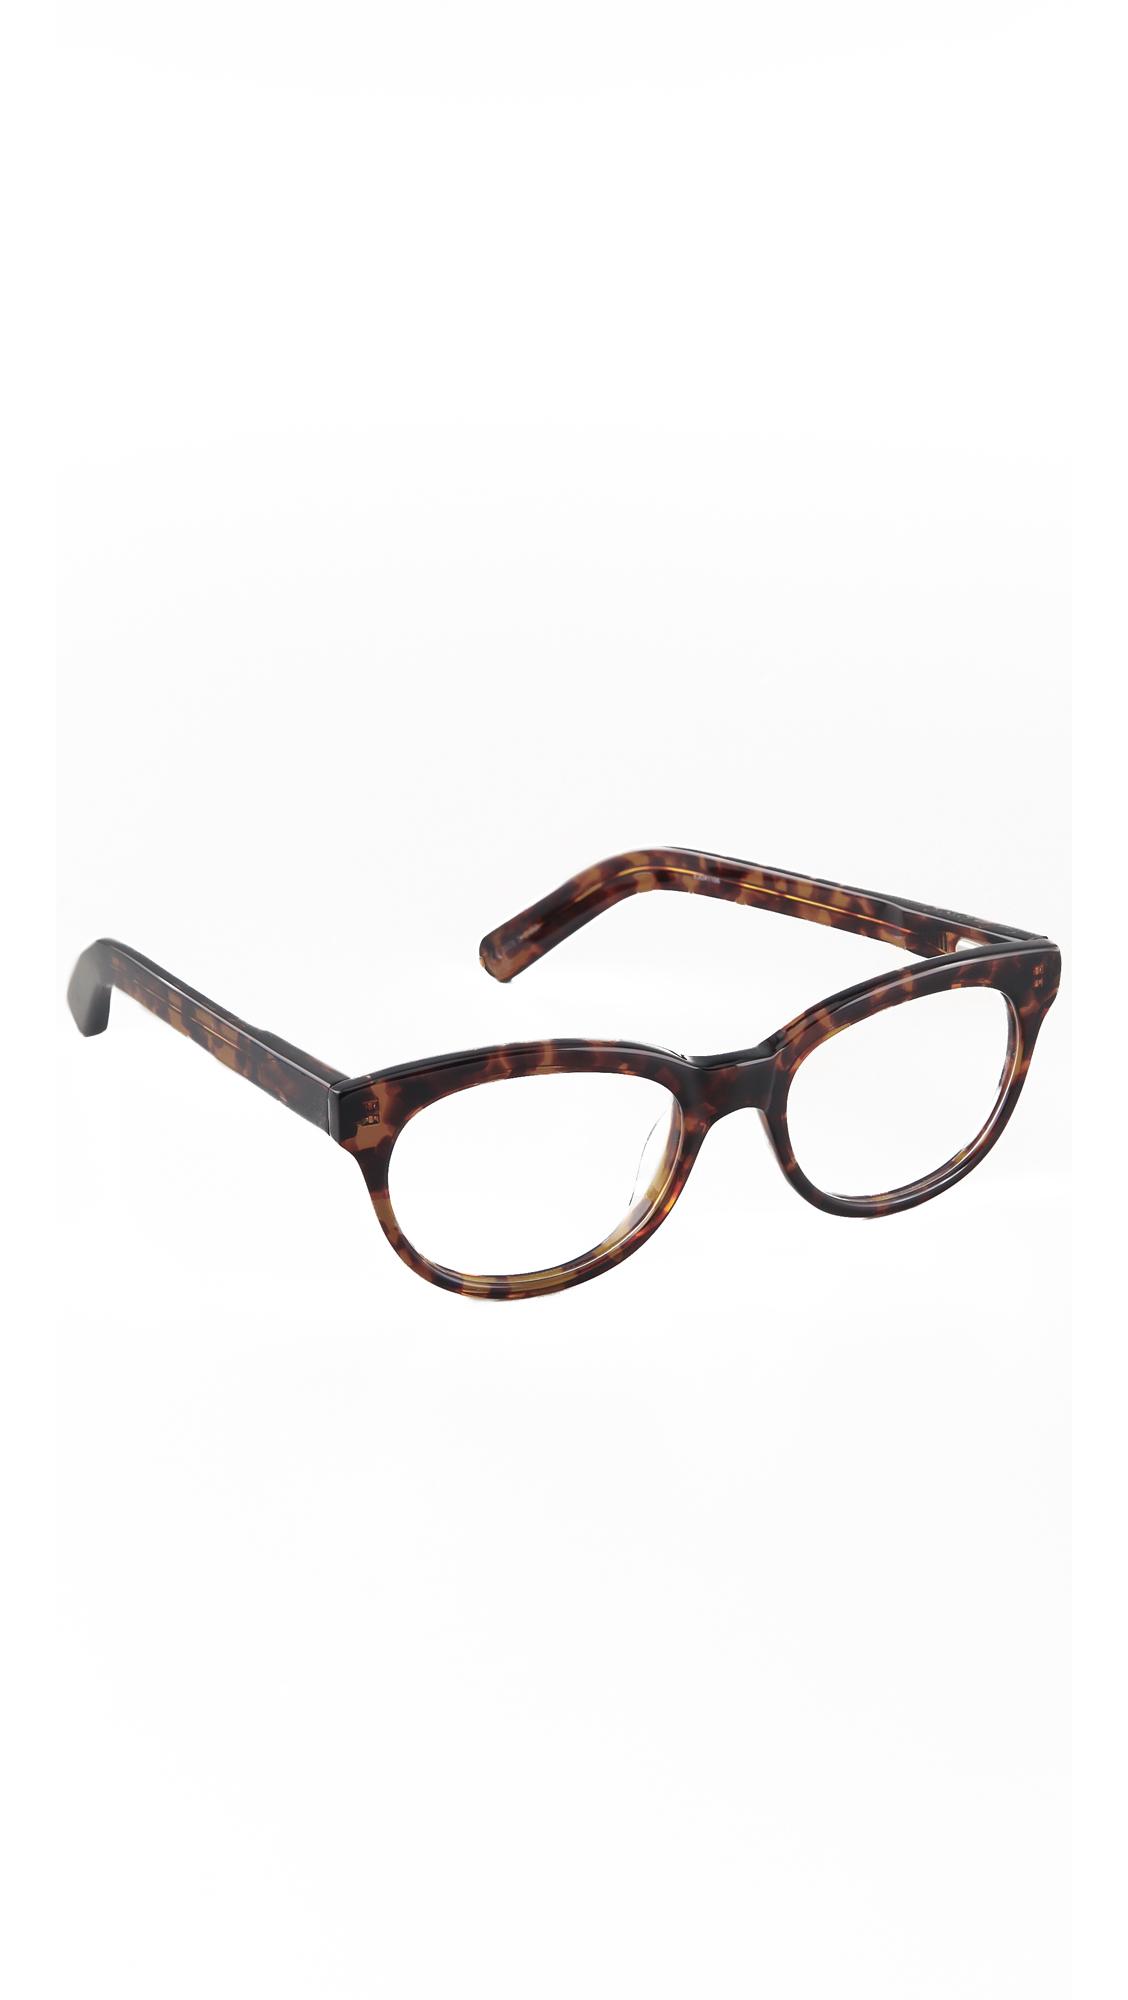 2a945a93800c4 Elizabeth and James Spring Glasses on PopScreen